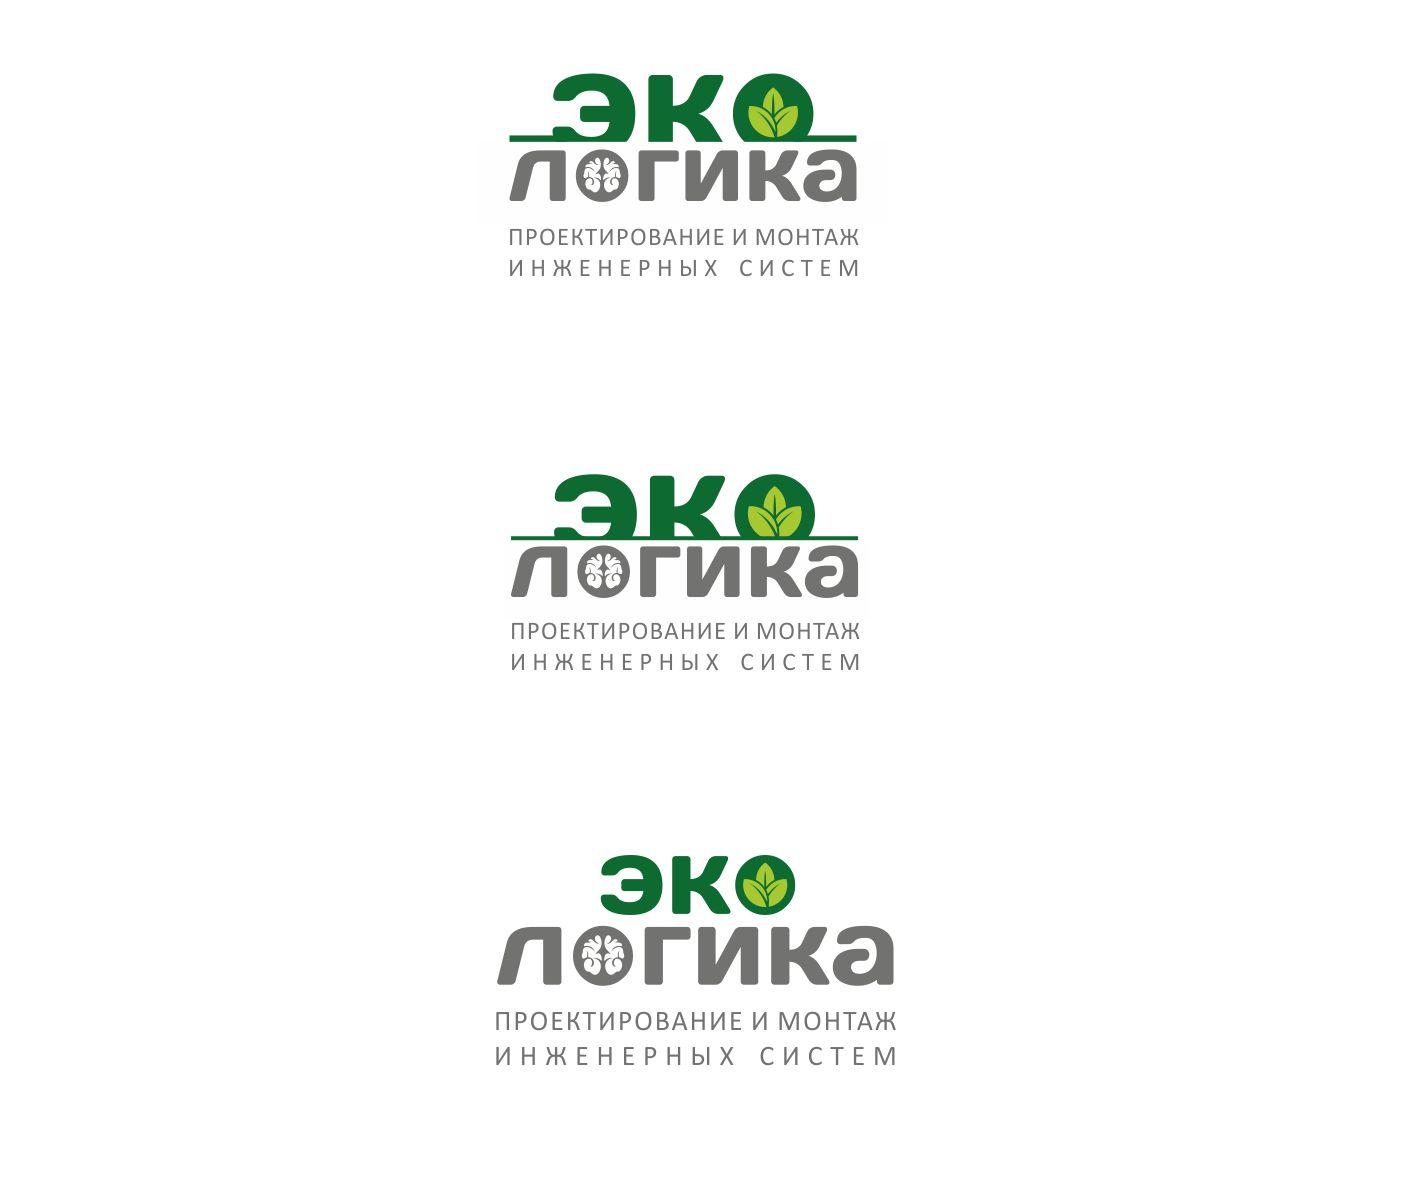 Логотип ЭКОЛОГИКА фото f_832593ed4d5a3b44.jpg